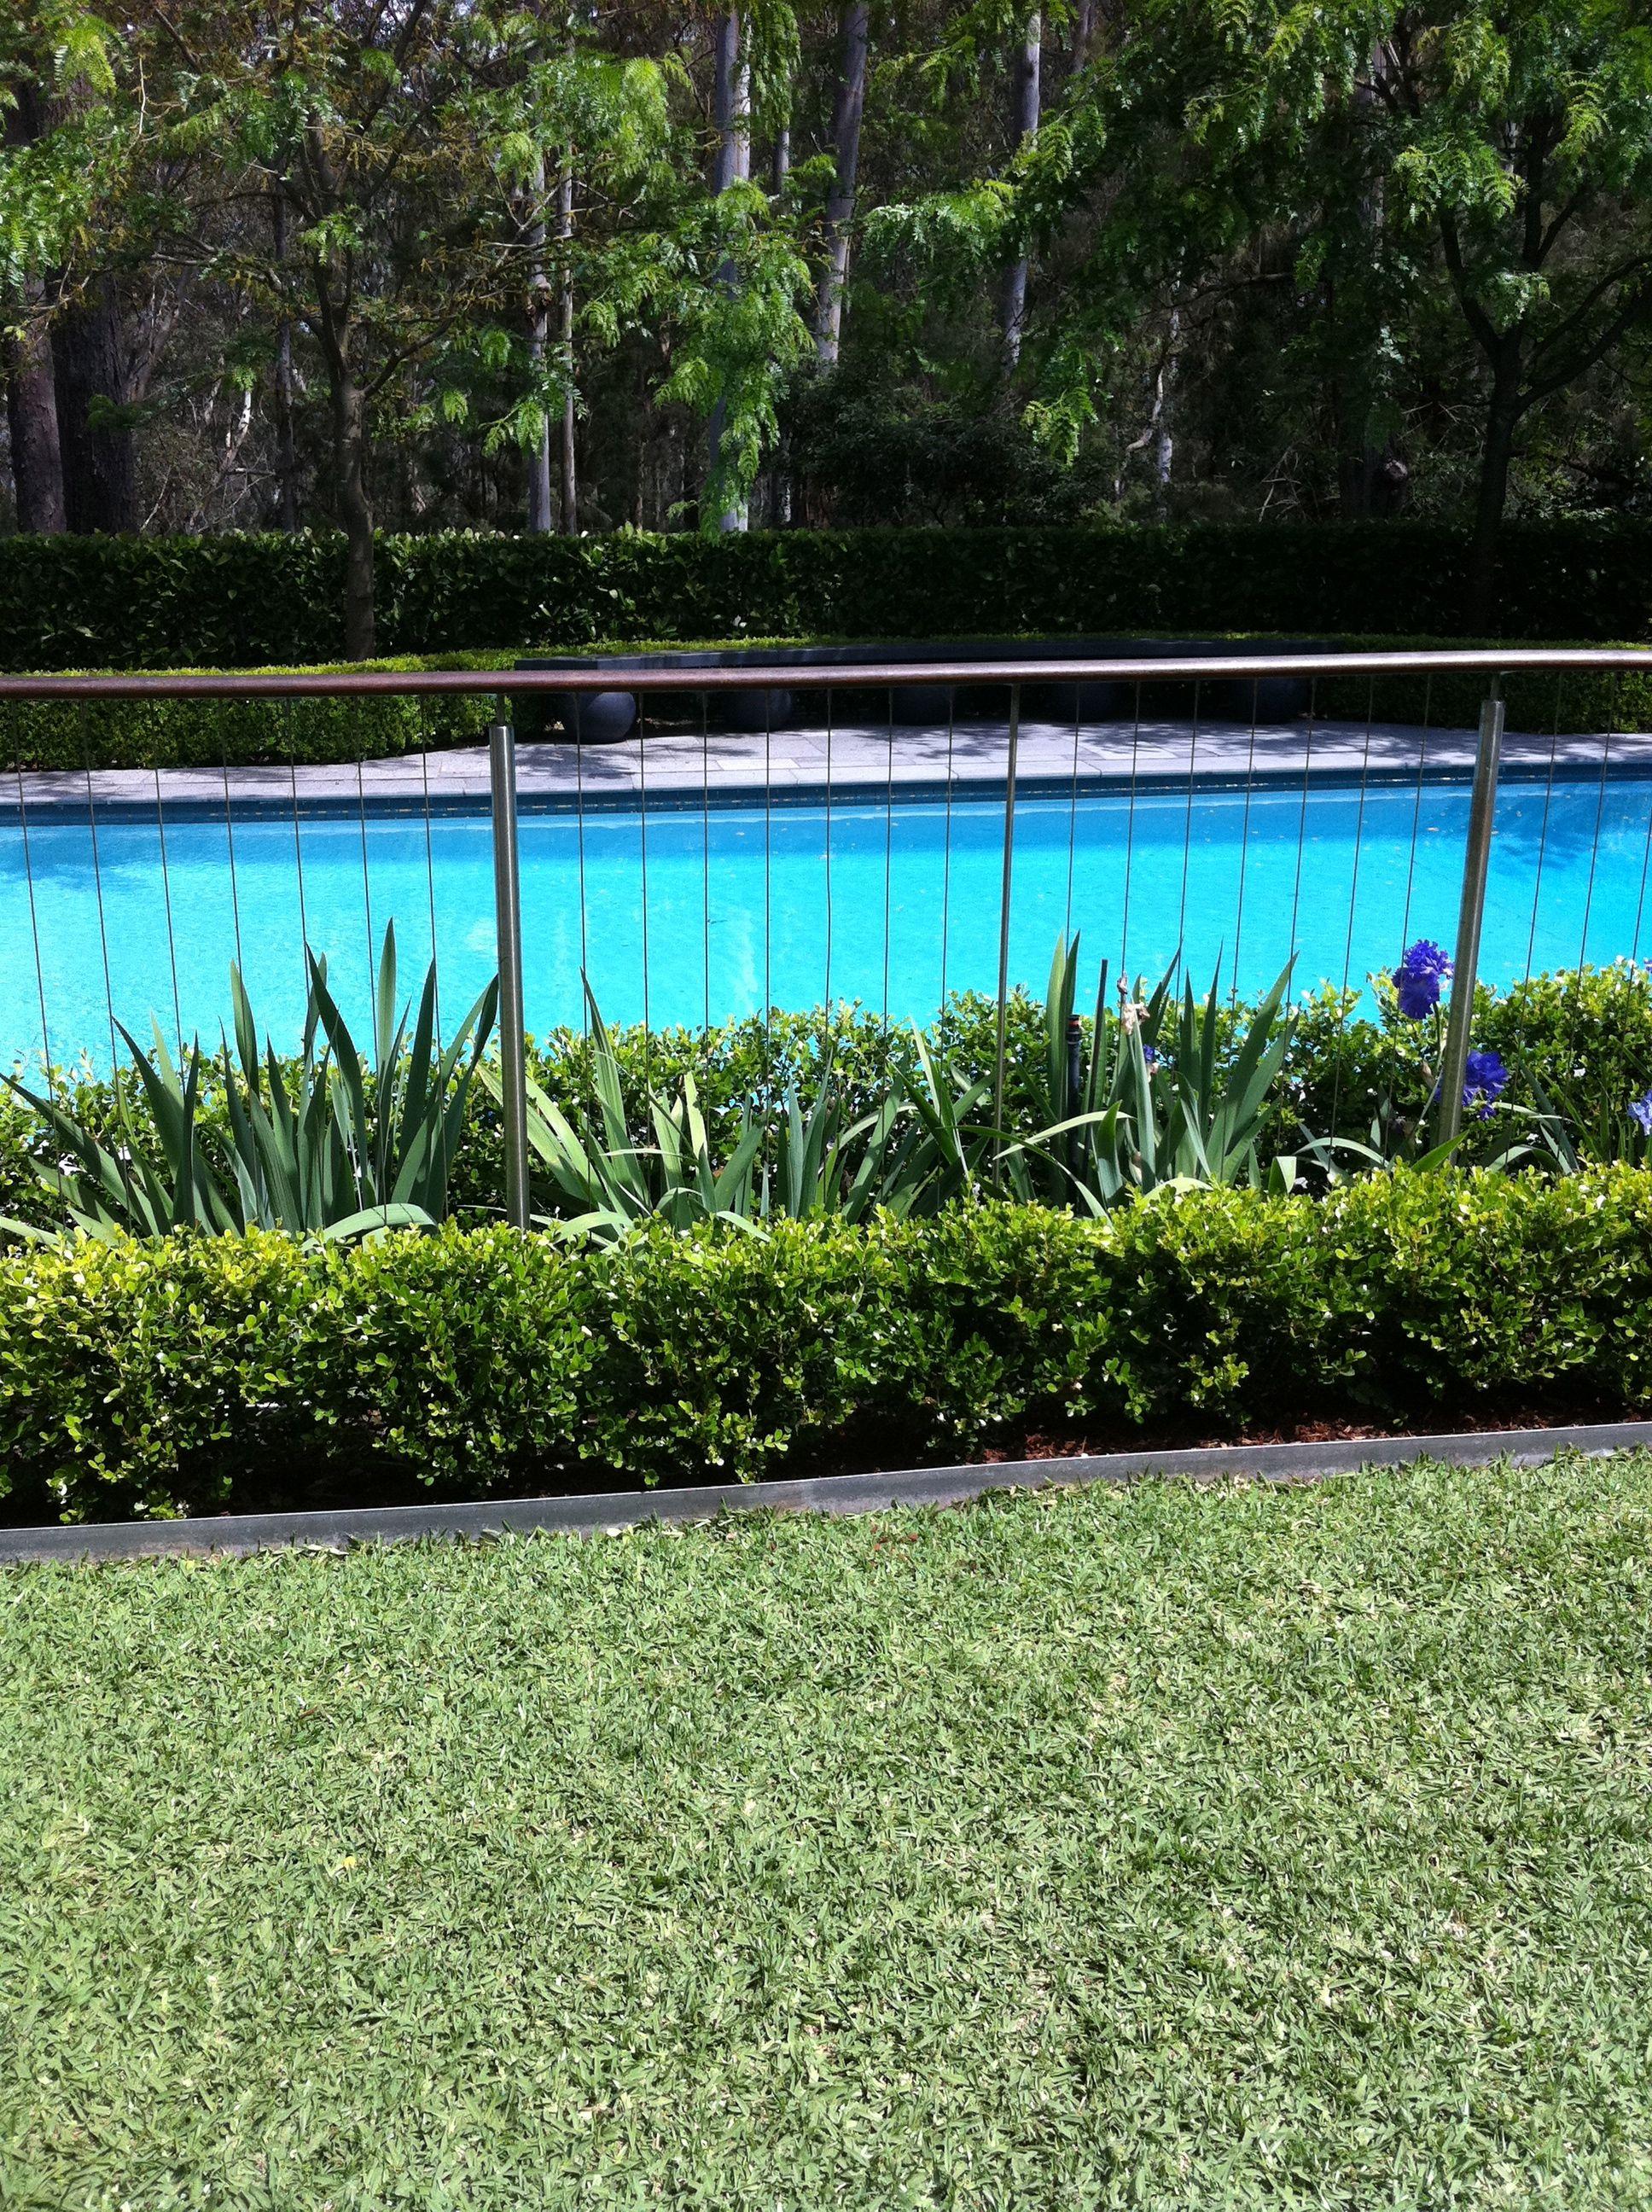 Pool Fence Pool Fencing Landscaping Backyard Pool Landscaping Pool Plants